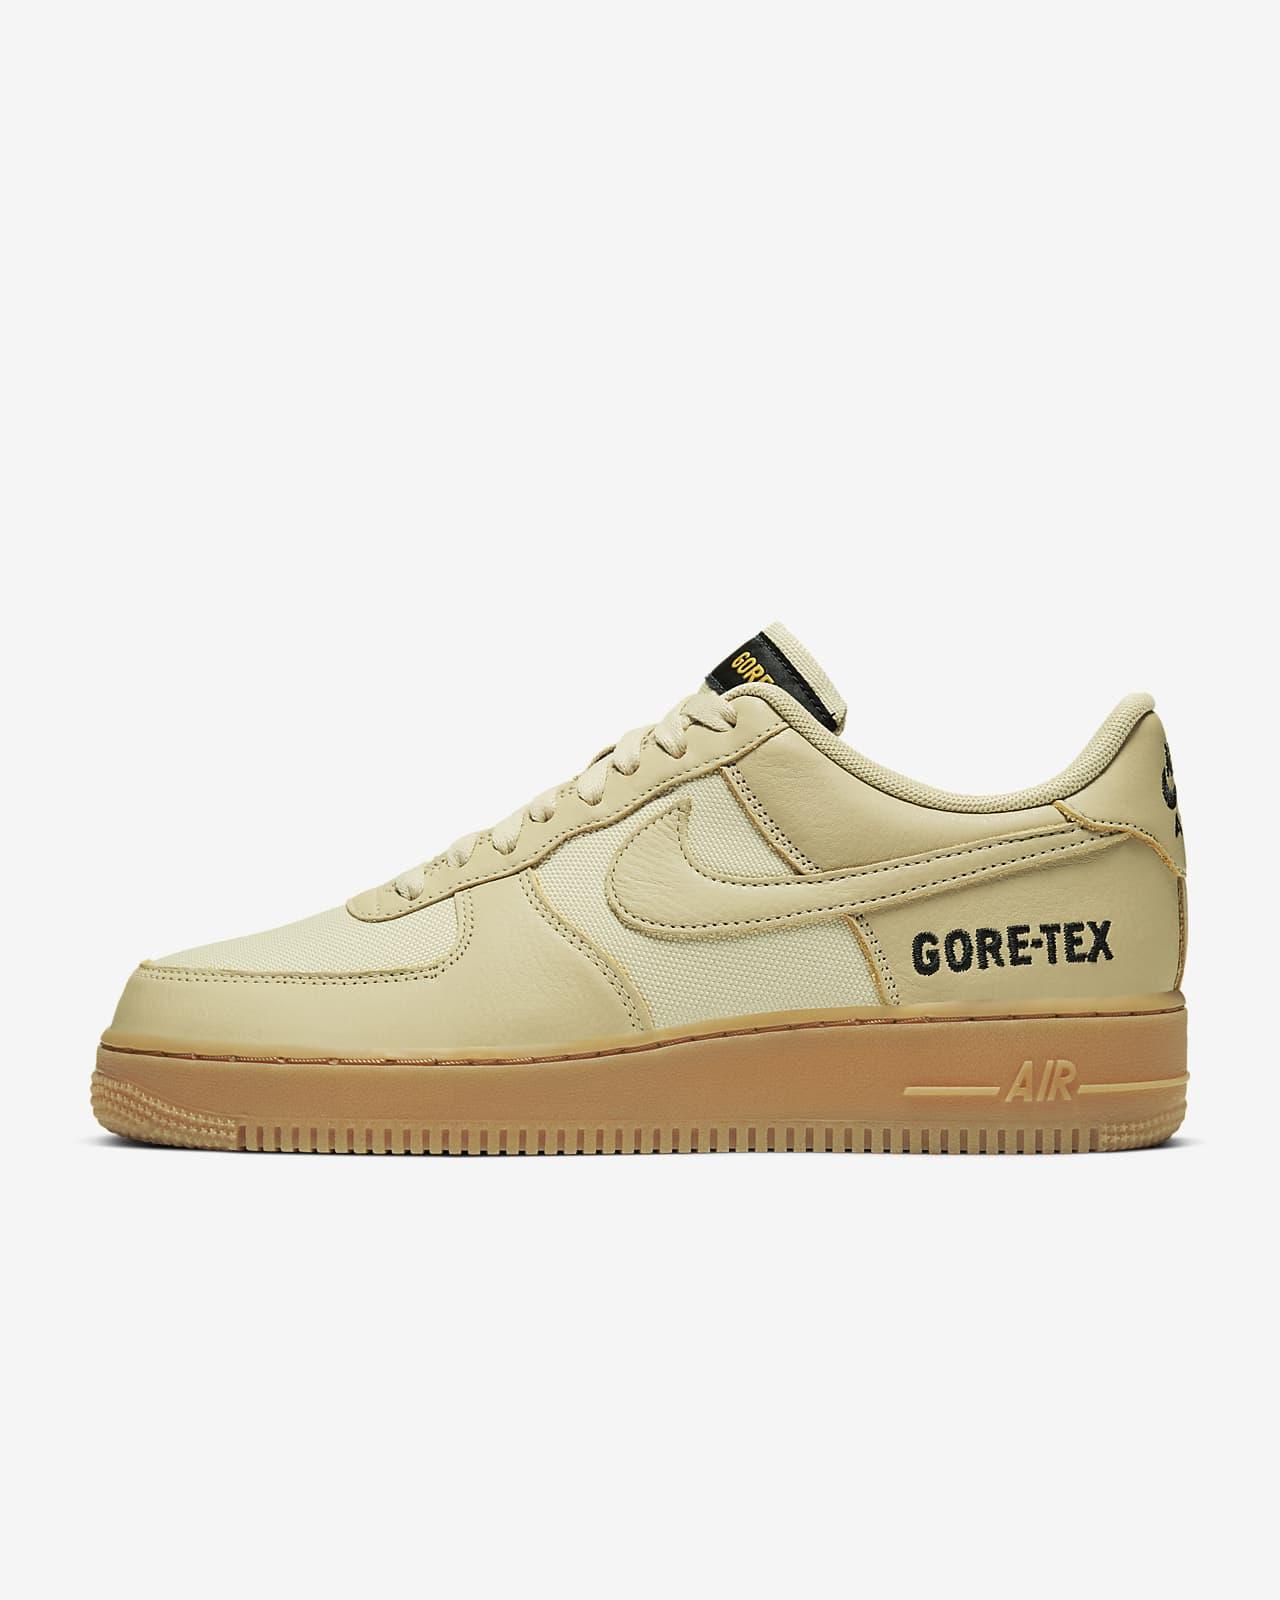 Nike Air Force 1 GORE-TEX ® Shoe